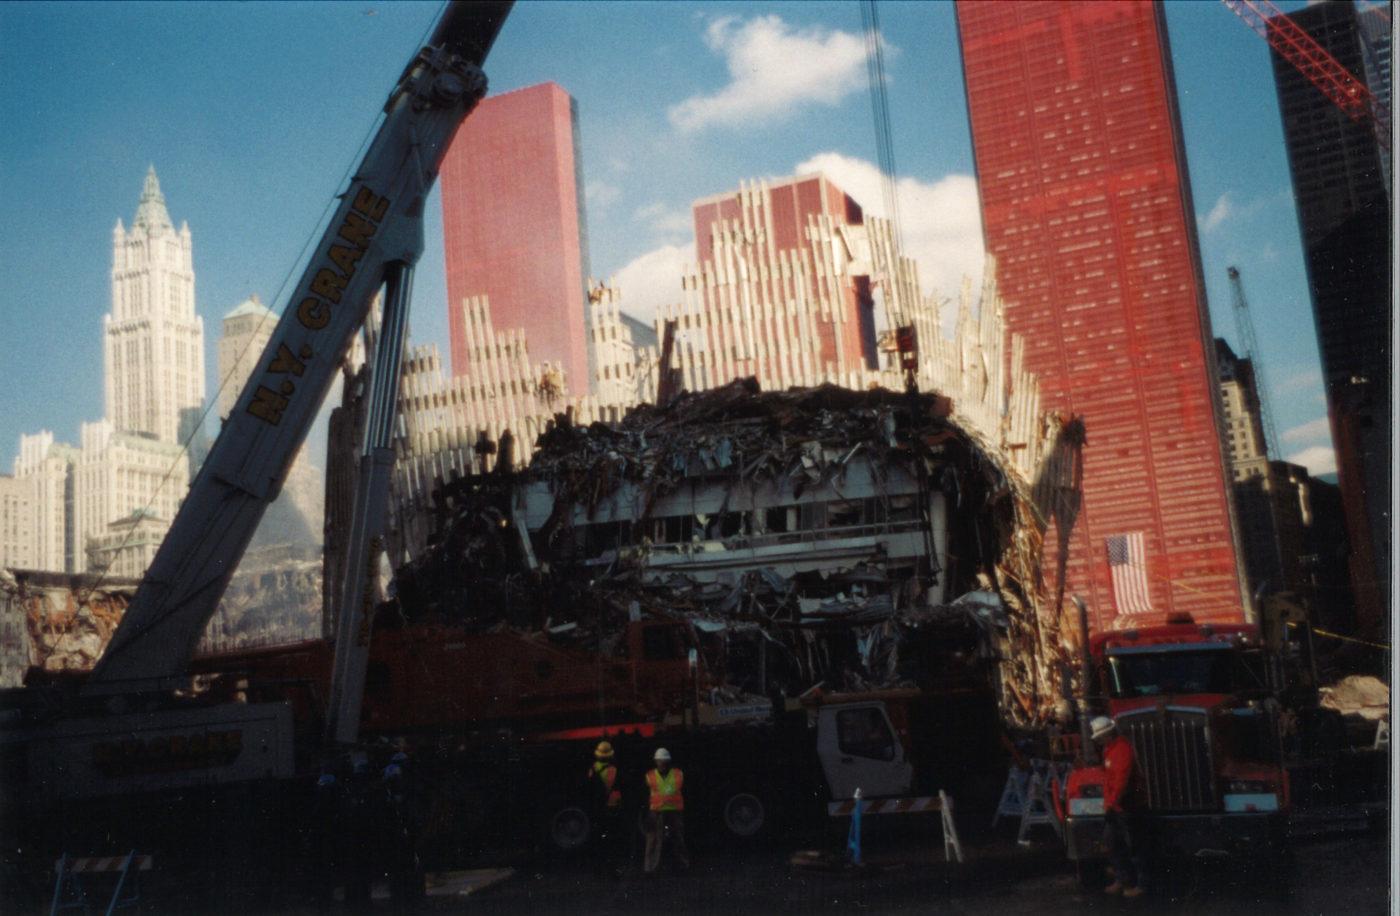 N.Y Crane Working on Destroyed Tower